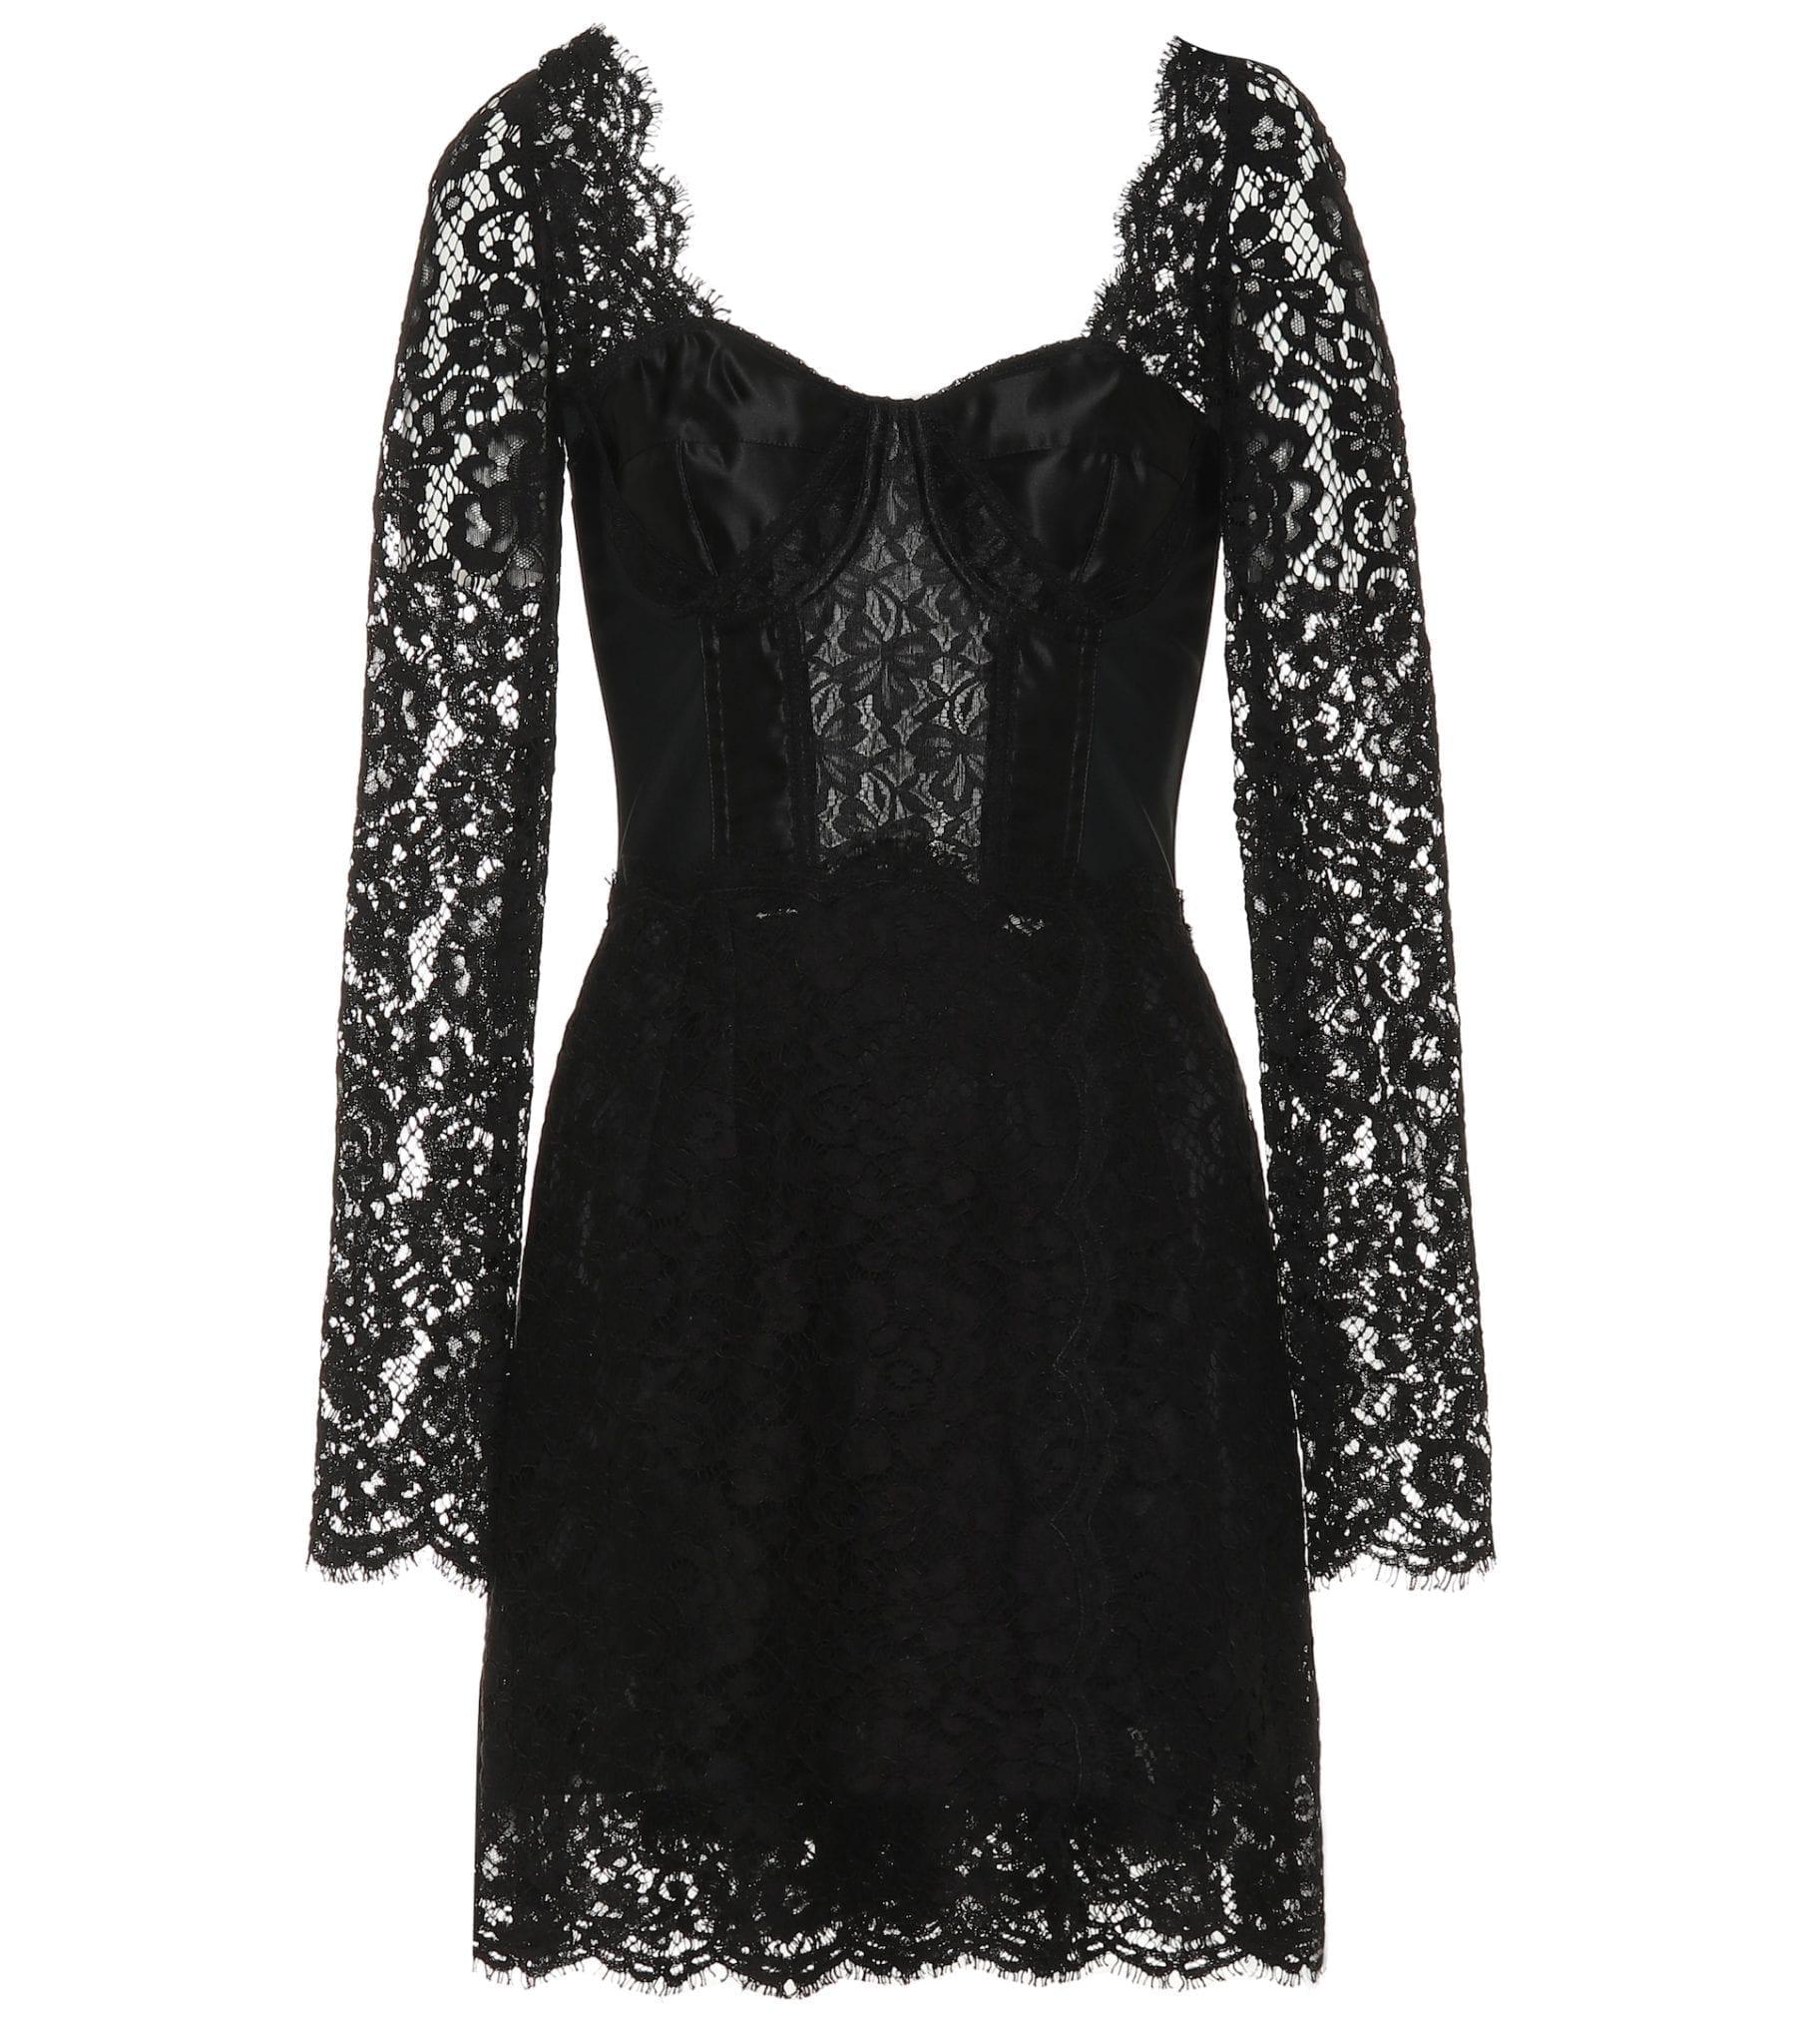 DOLCE & GABBANA Cotton-Blend Lace Mini Black Dress